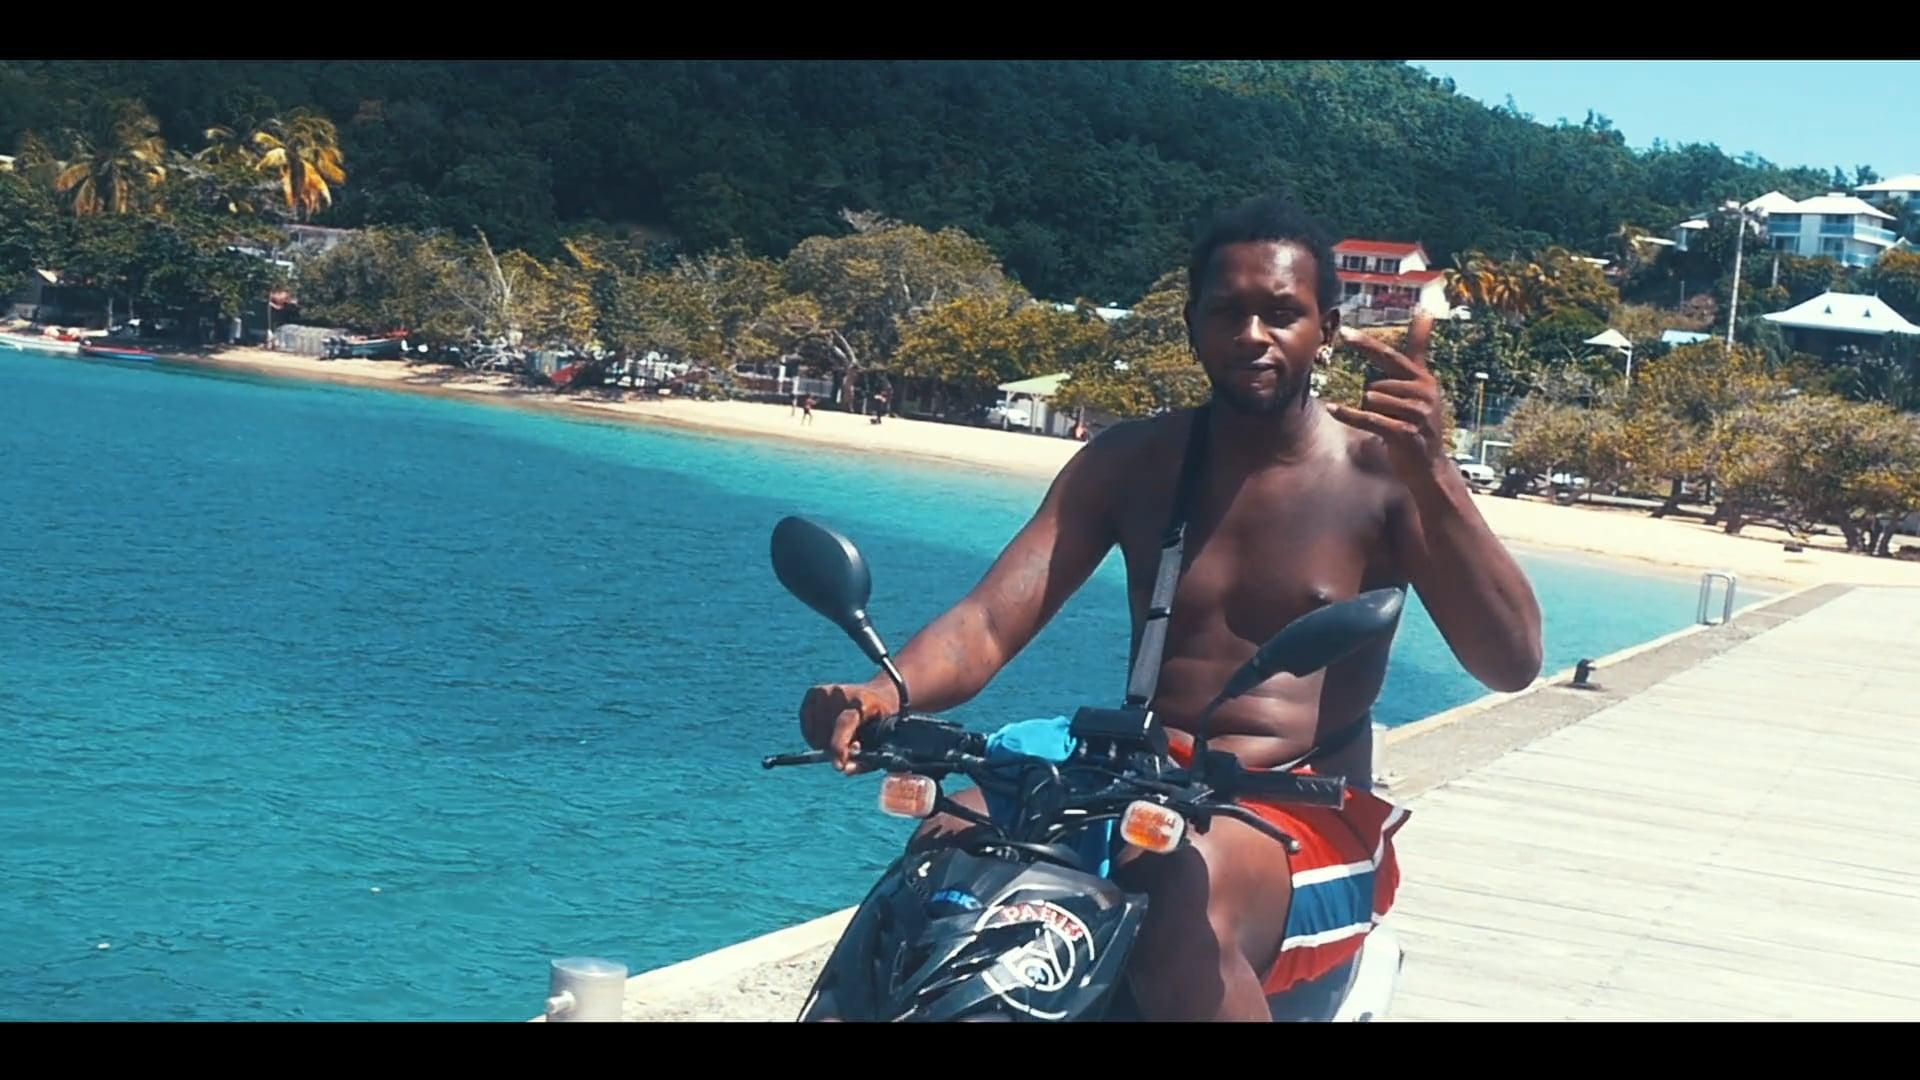 Street life - Tartane, Martinique (Volume. 2)